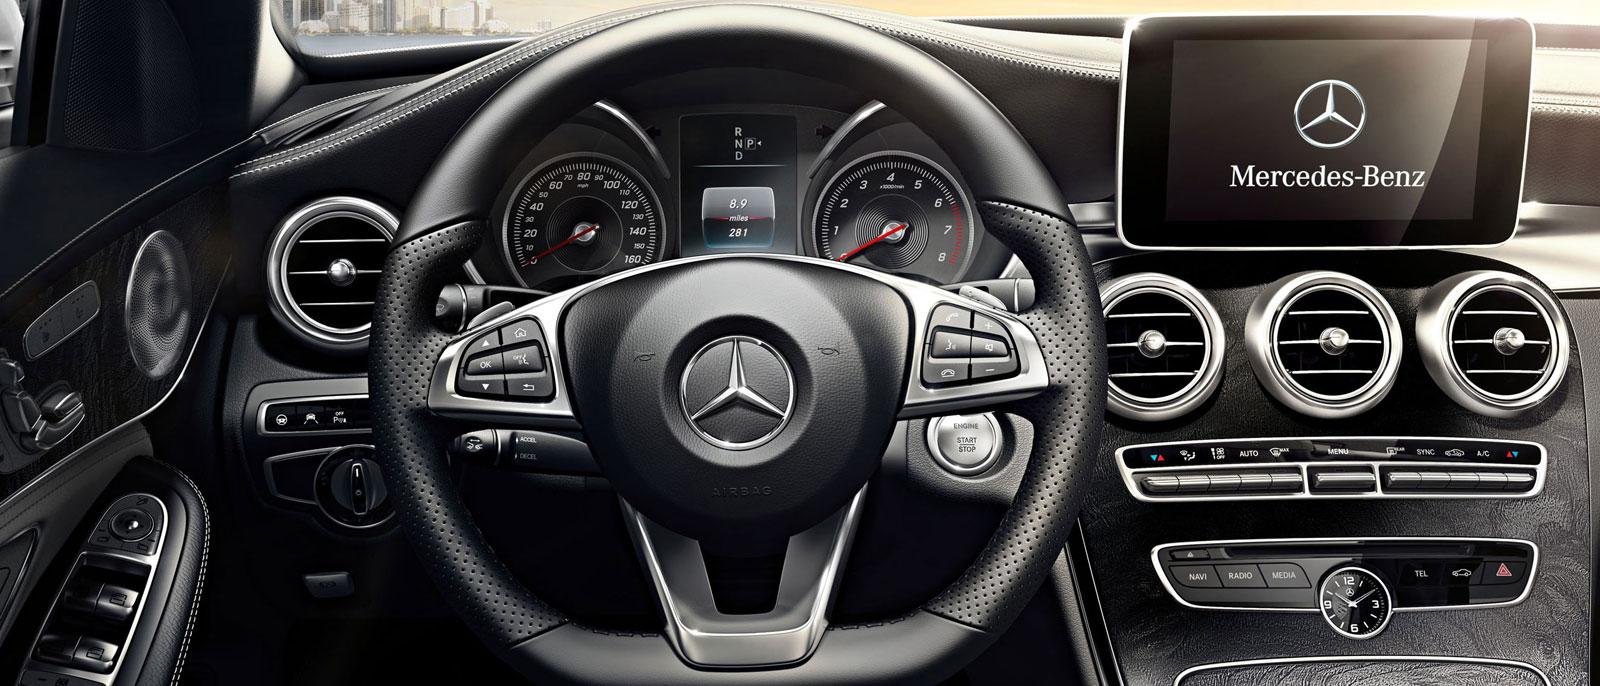 2016 Mercedes-Benz AMG C63 S